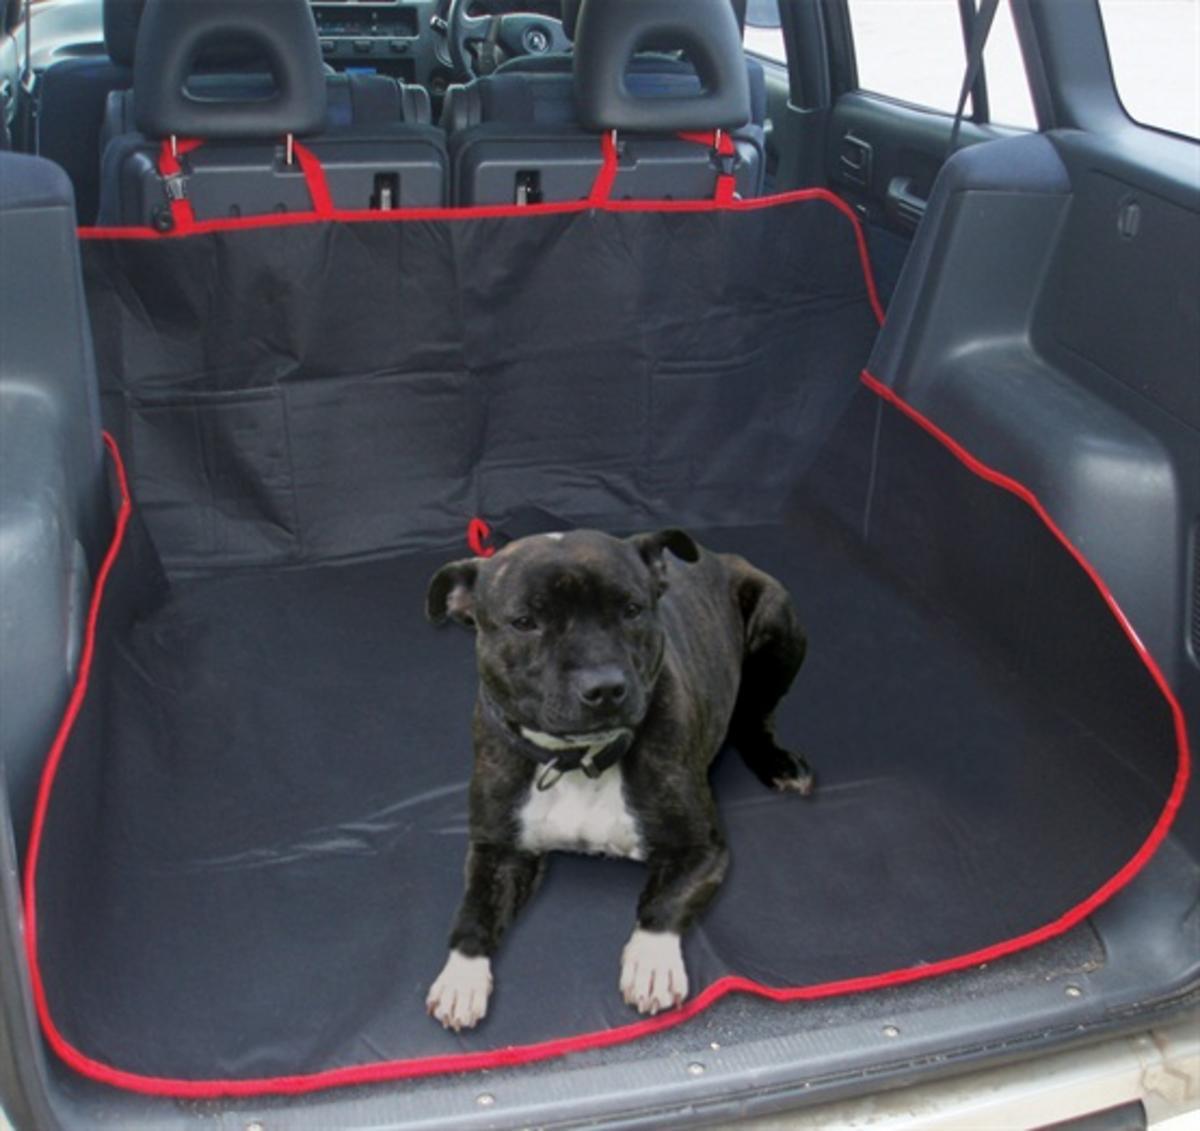 Streetwize SWPC4 Automotive Car Van Pet Vehicle Boot Liner For Hatchback Suv 4X4